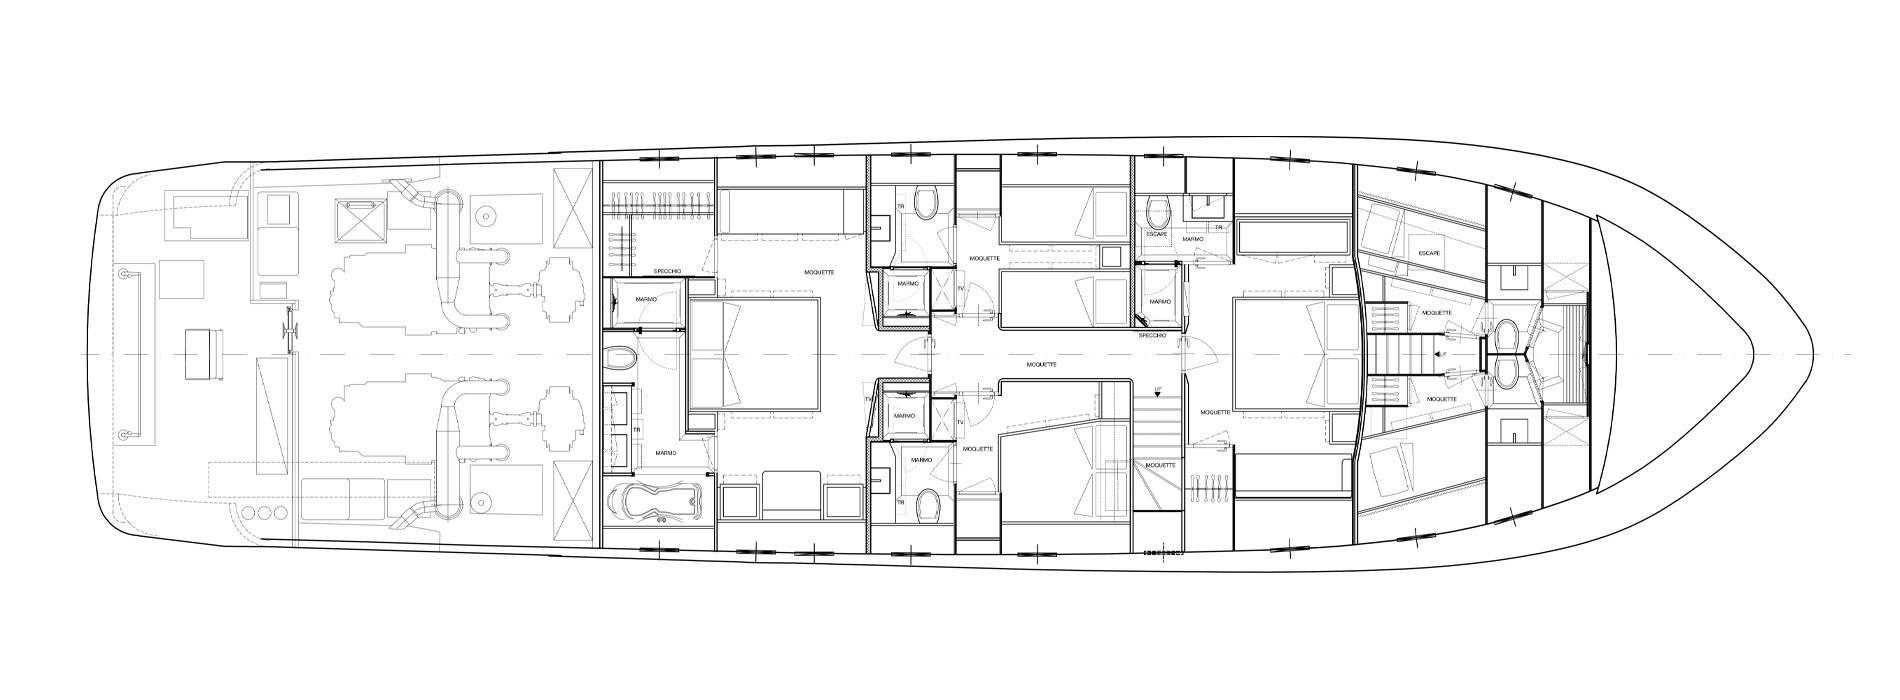 Sanlorenzo Yachts SL88-541 Нижняя палуба